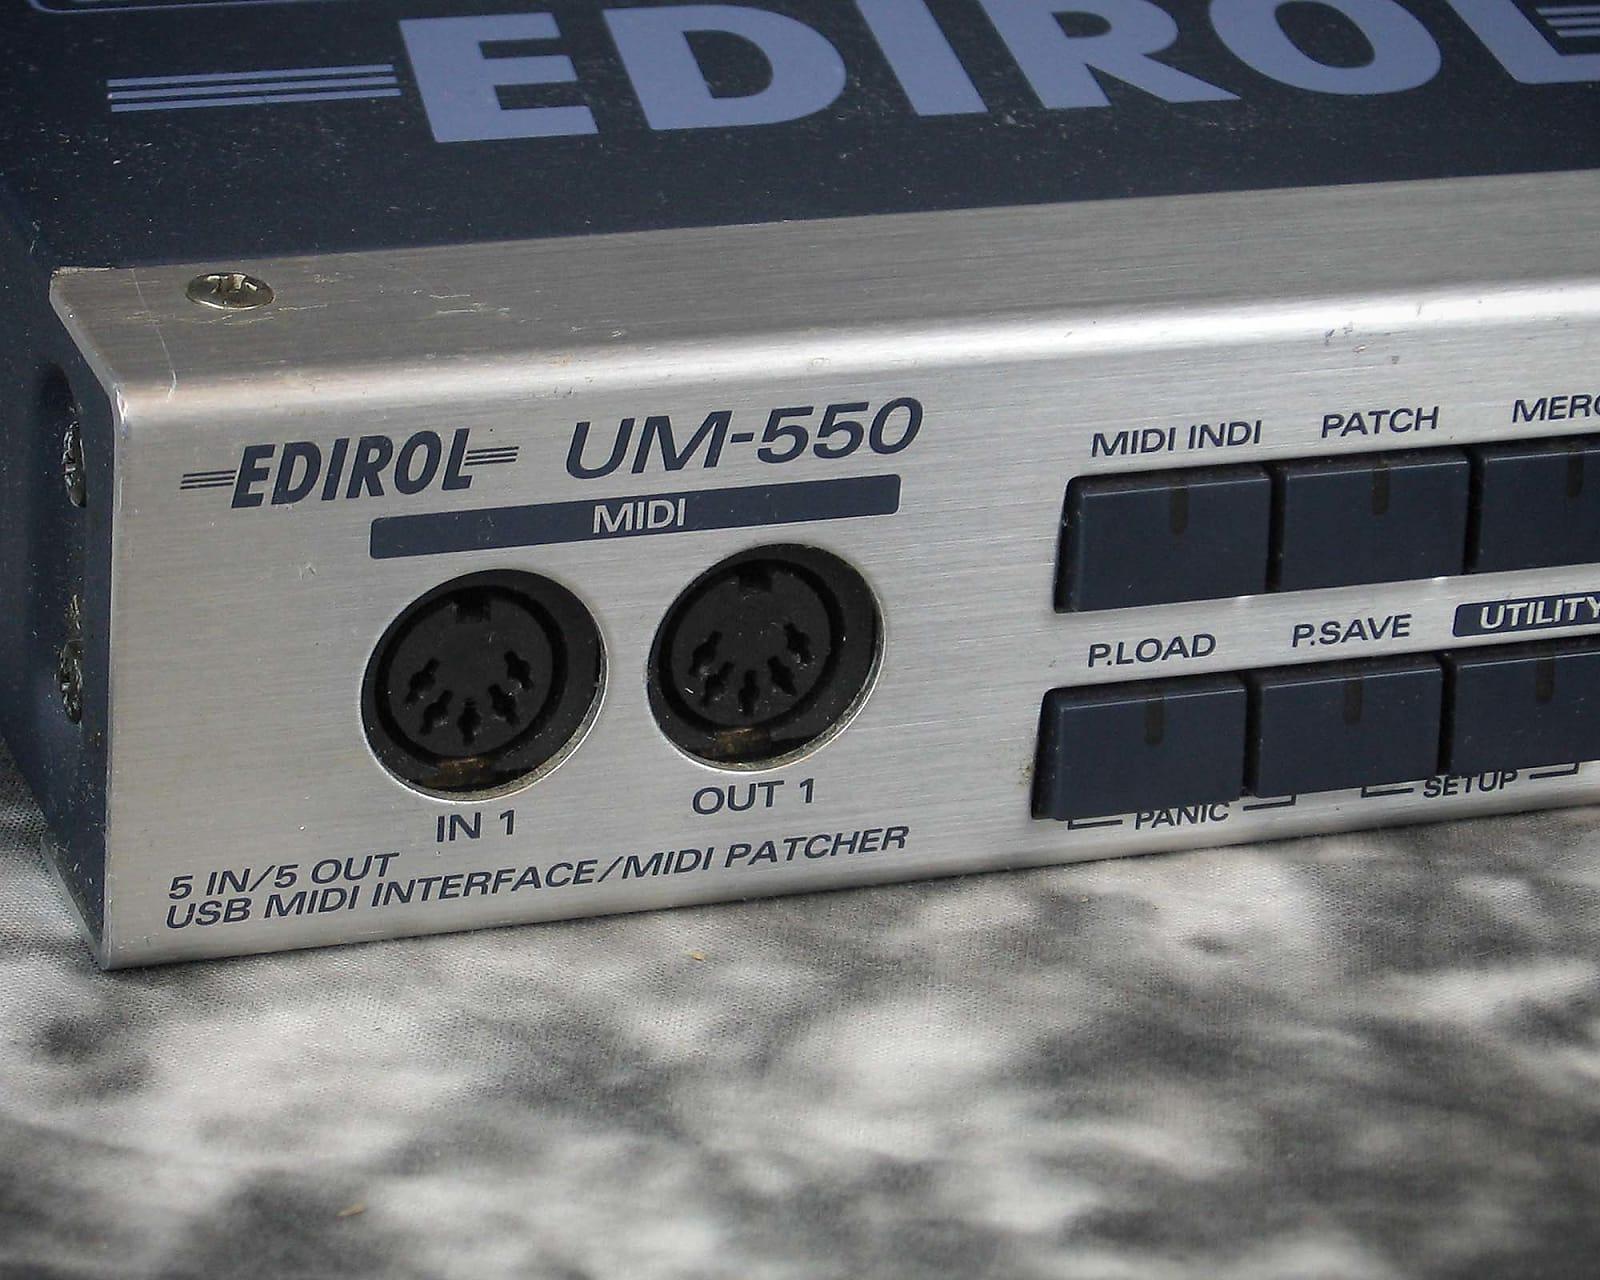 DRIVERS UPDATE: EDIROL UM 550